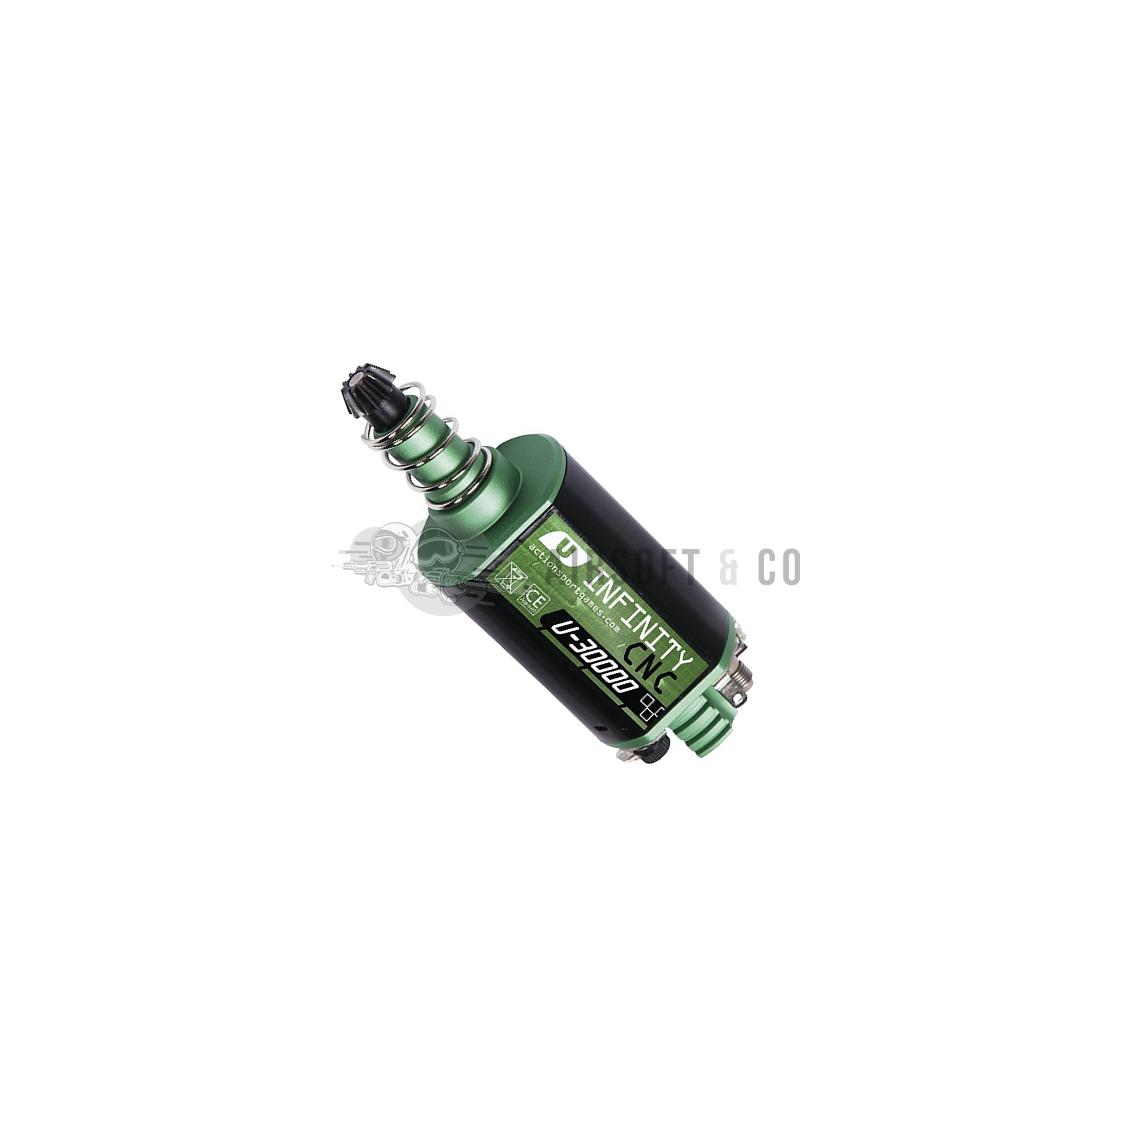 Moteur Infinity CNC U-30000 (axe long)